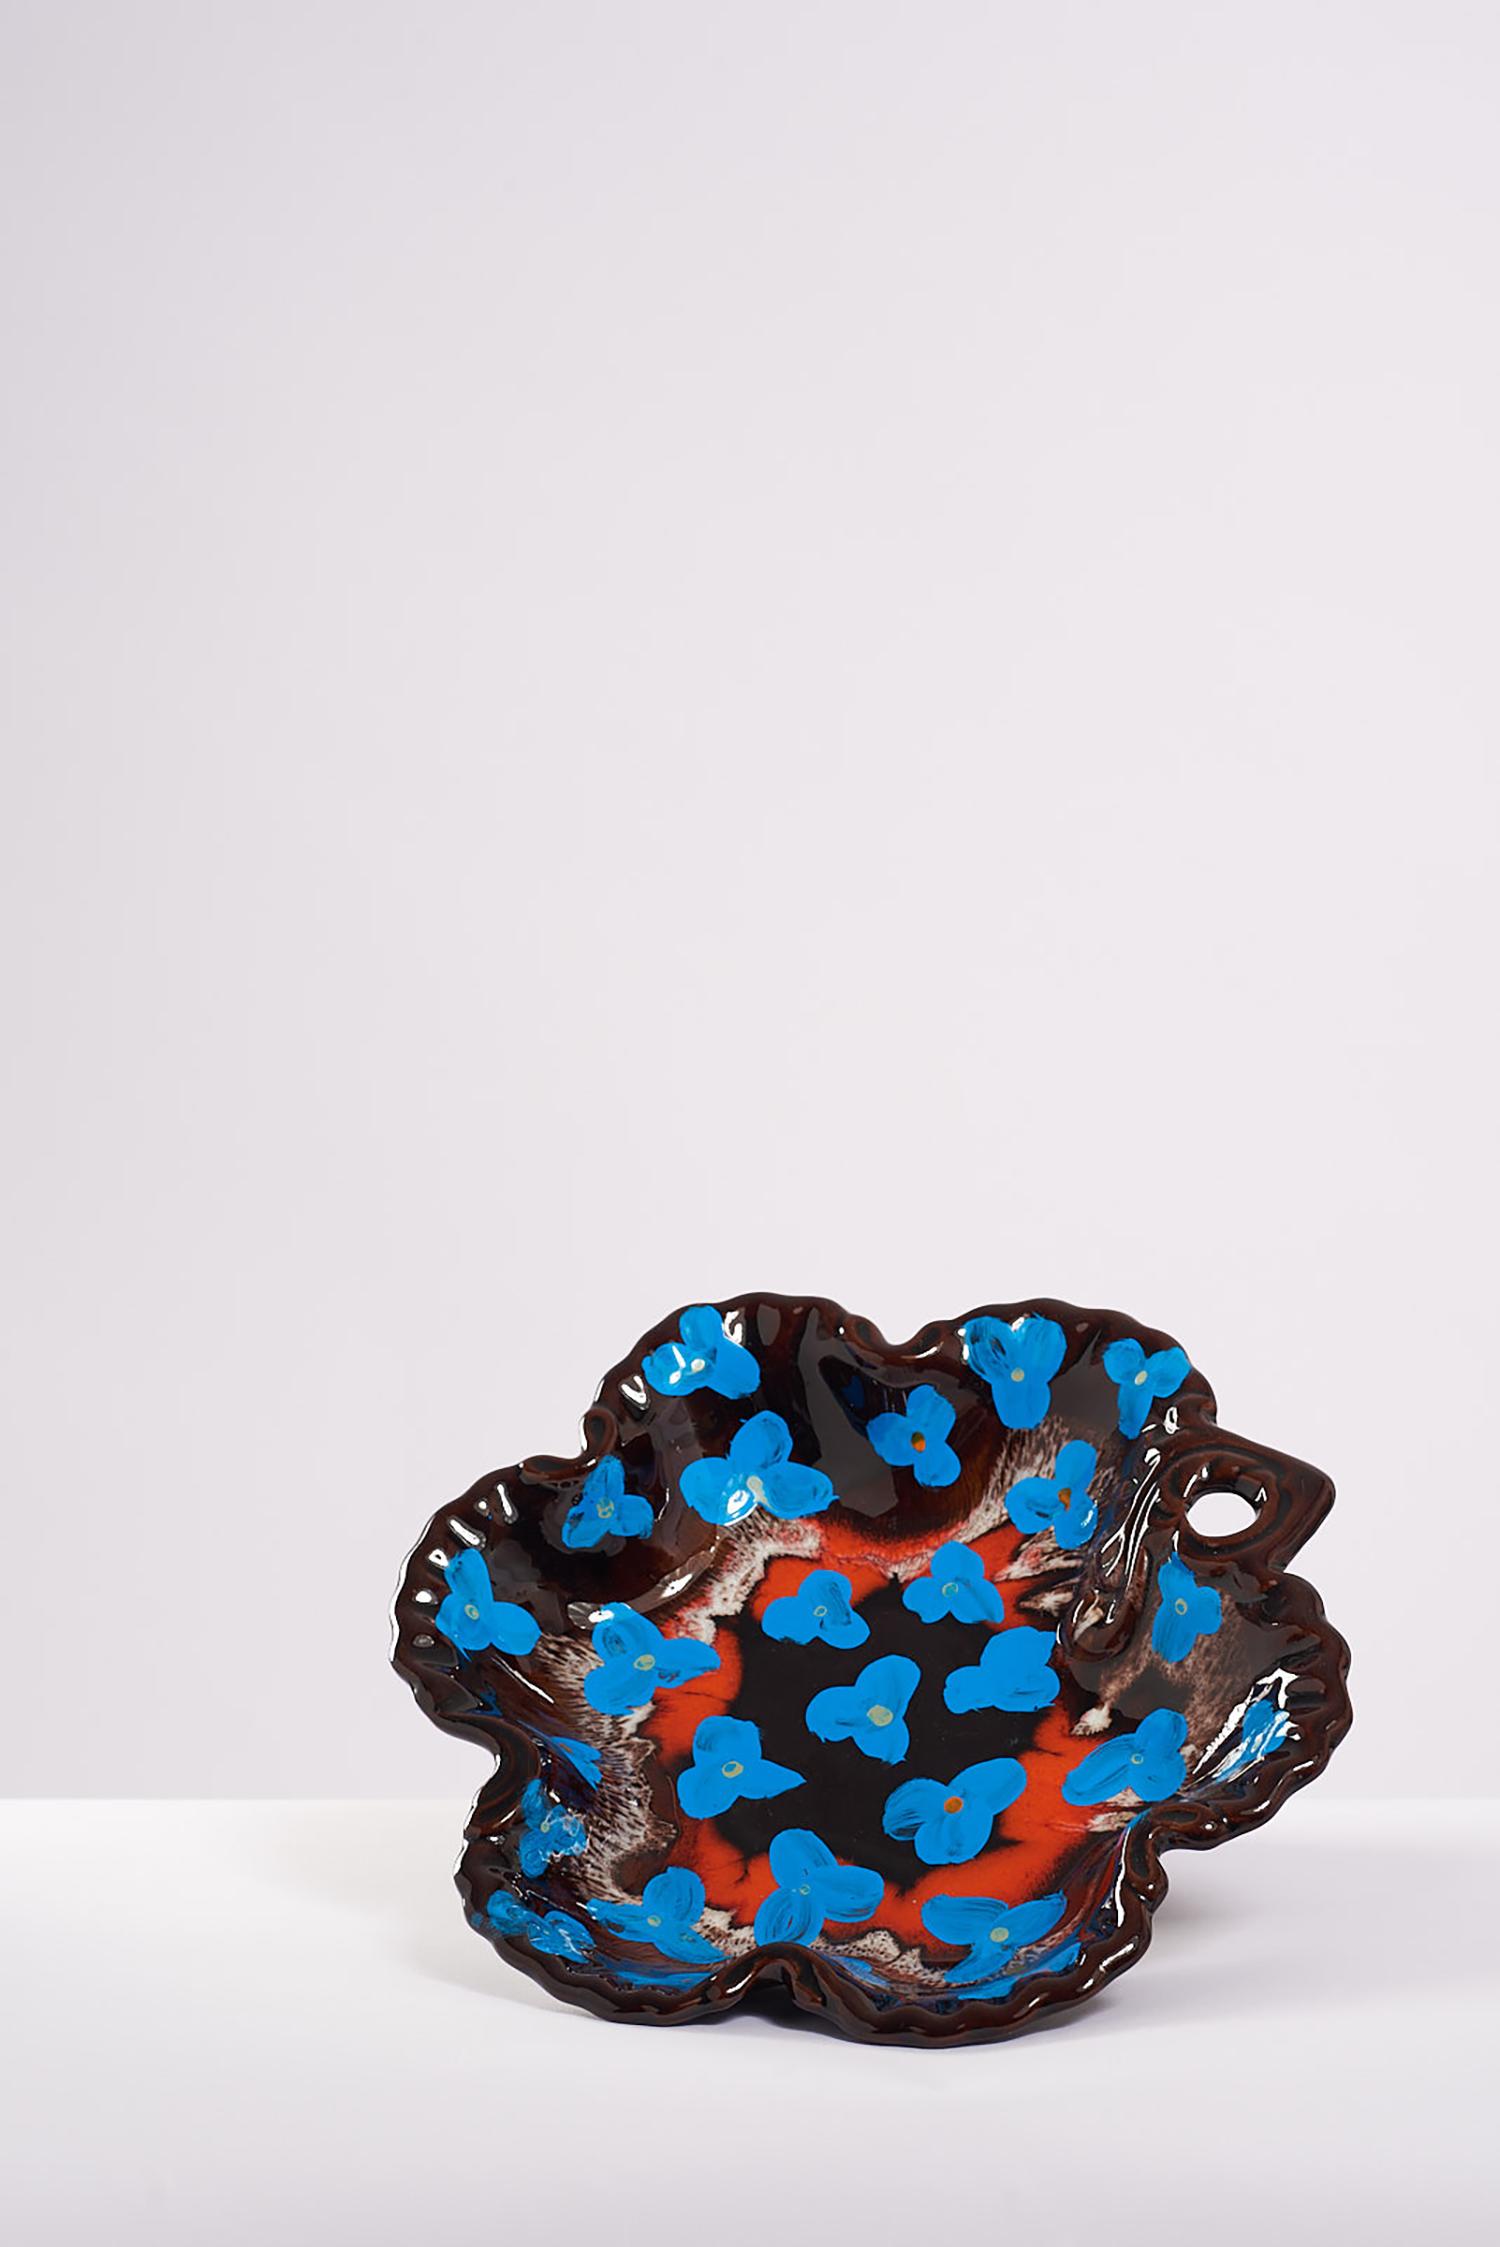 Blue flower bowl